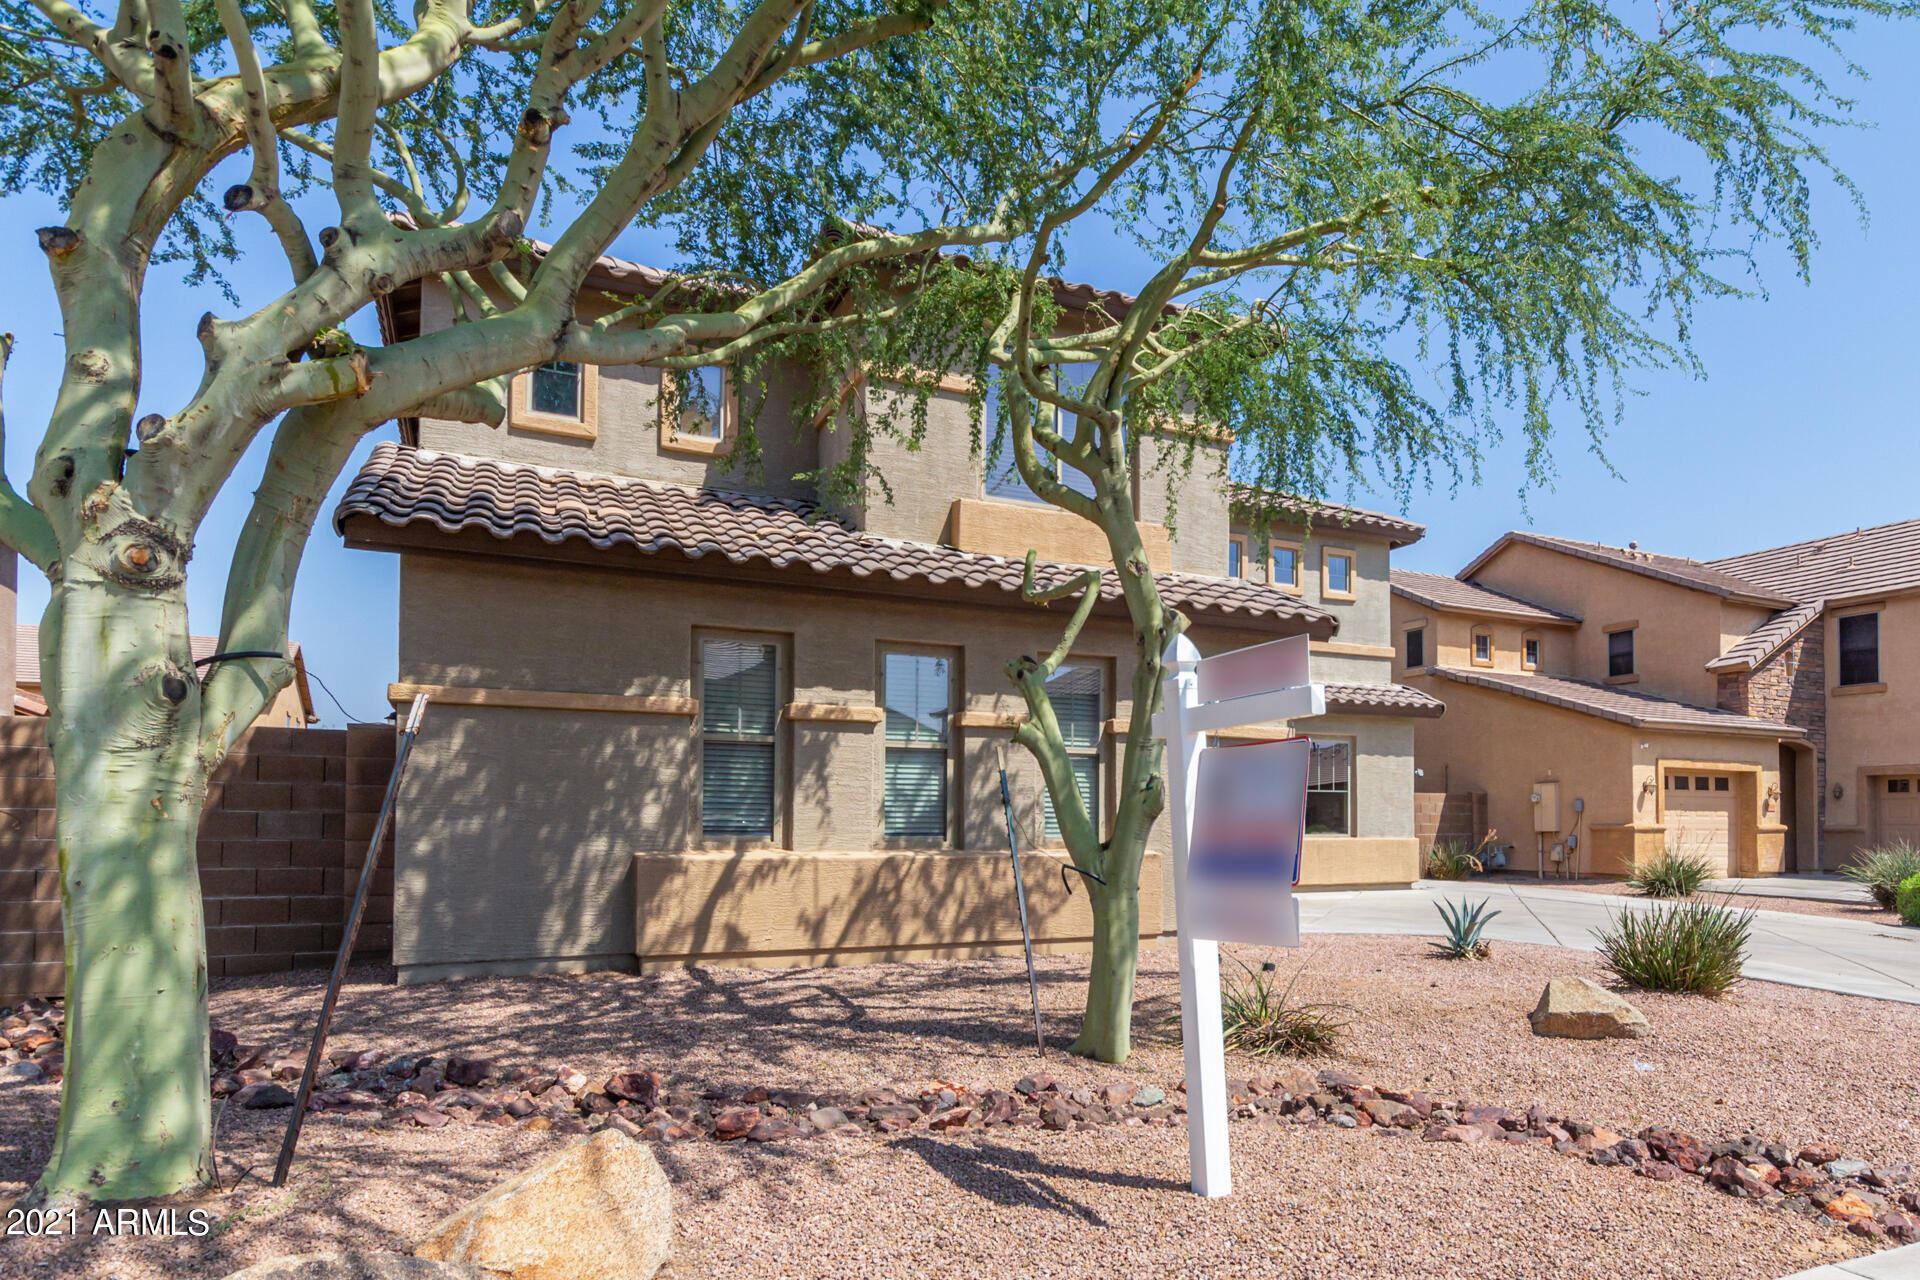 Photo of 6512 W CONSTANCE Way, Laveen, AZ 85339 (MLS # 6258230)